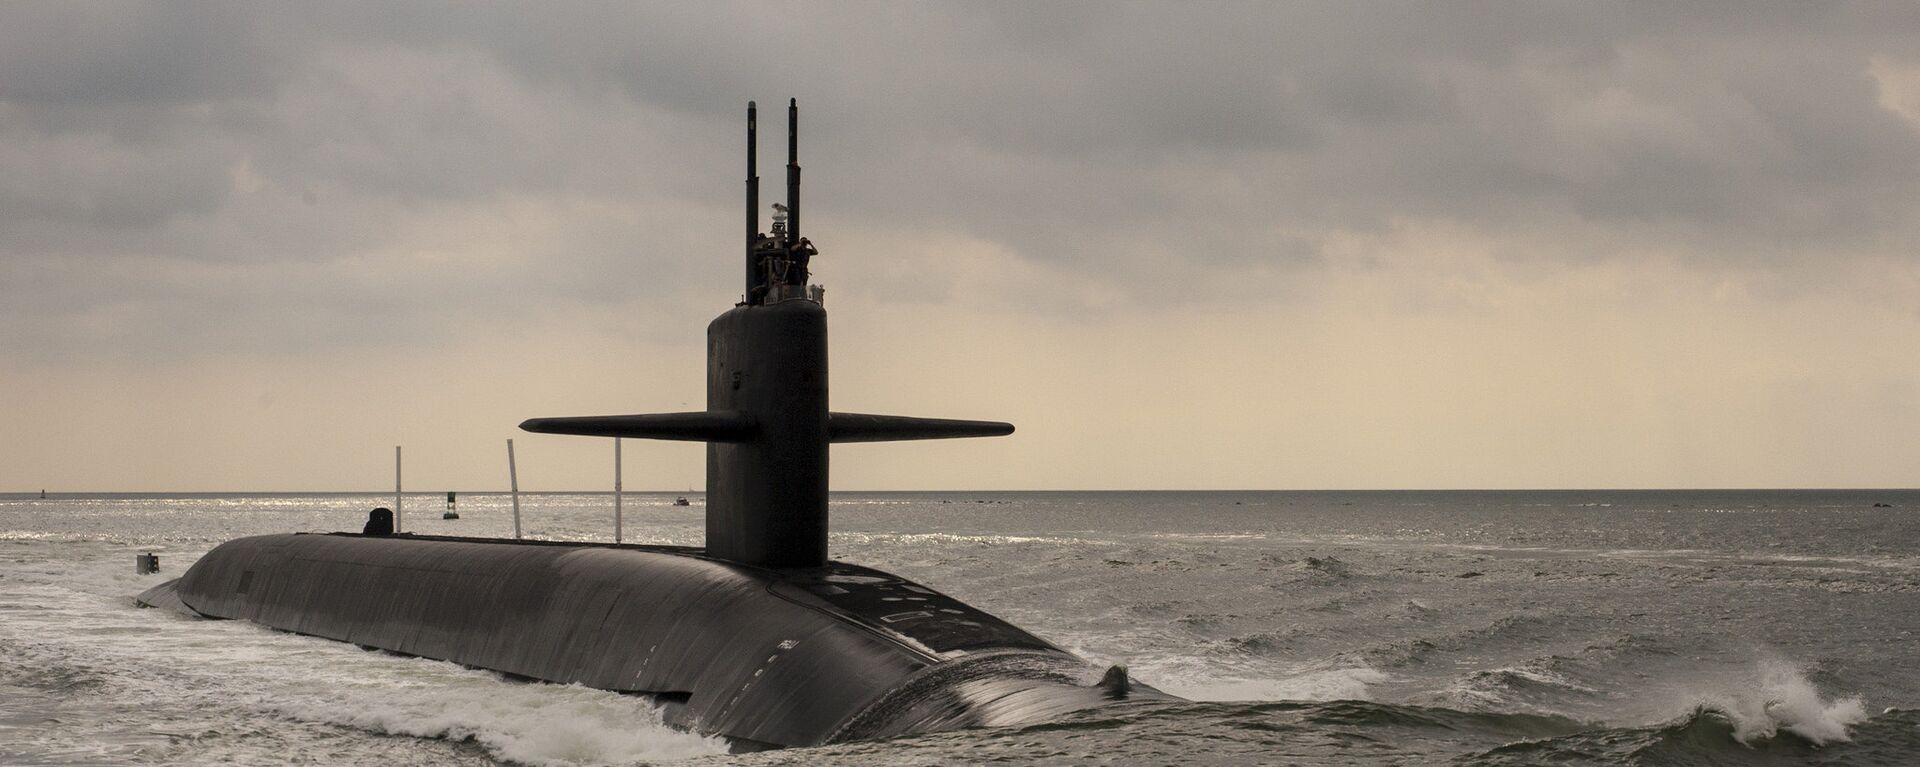 Sottomarino nucleare USA di classe Ohio  - Sputnik Italia, 1920, 24.09.2021